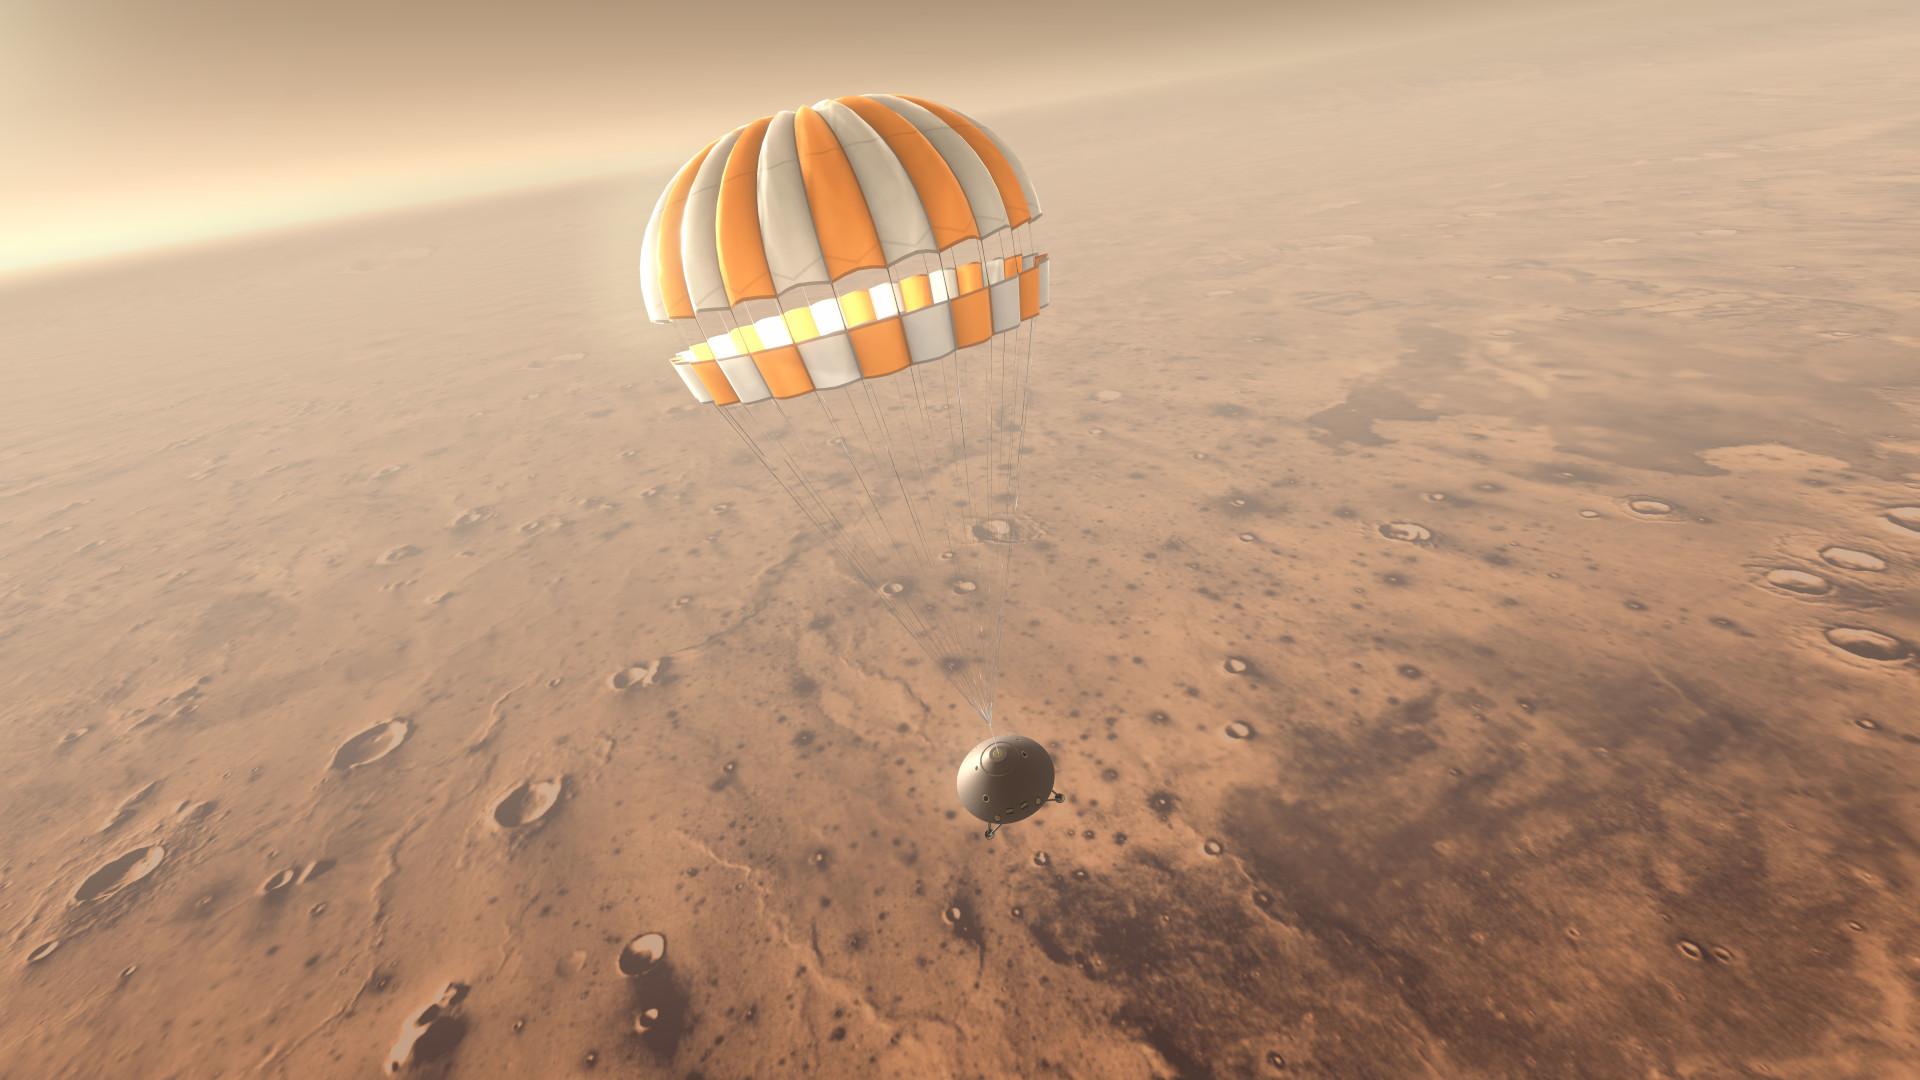 InSight's-landing-on-Mars-2018-NSA-ESA-IPGP-SEIS-CNES